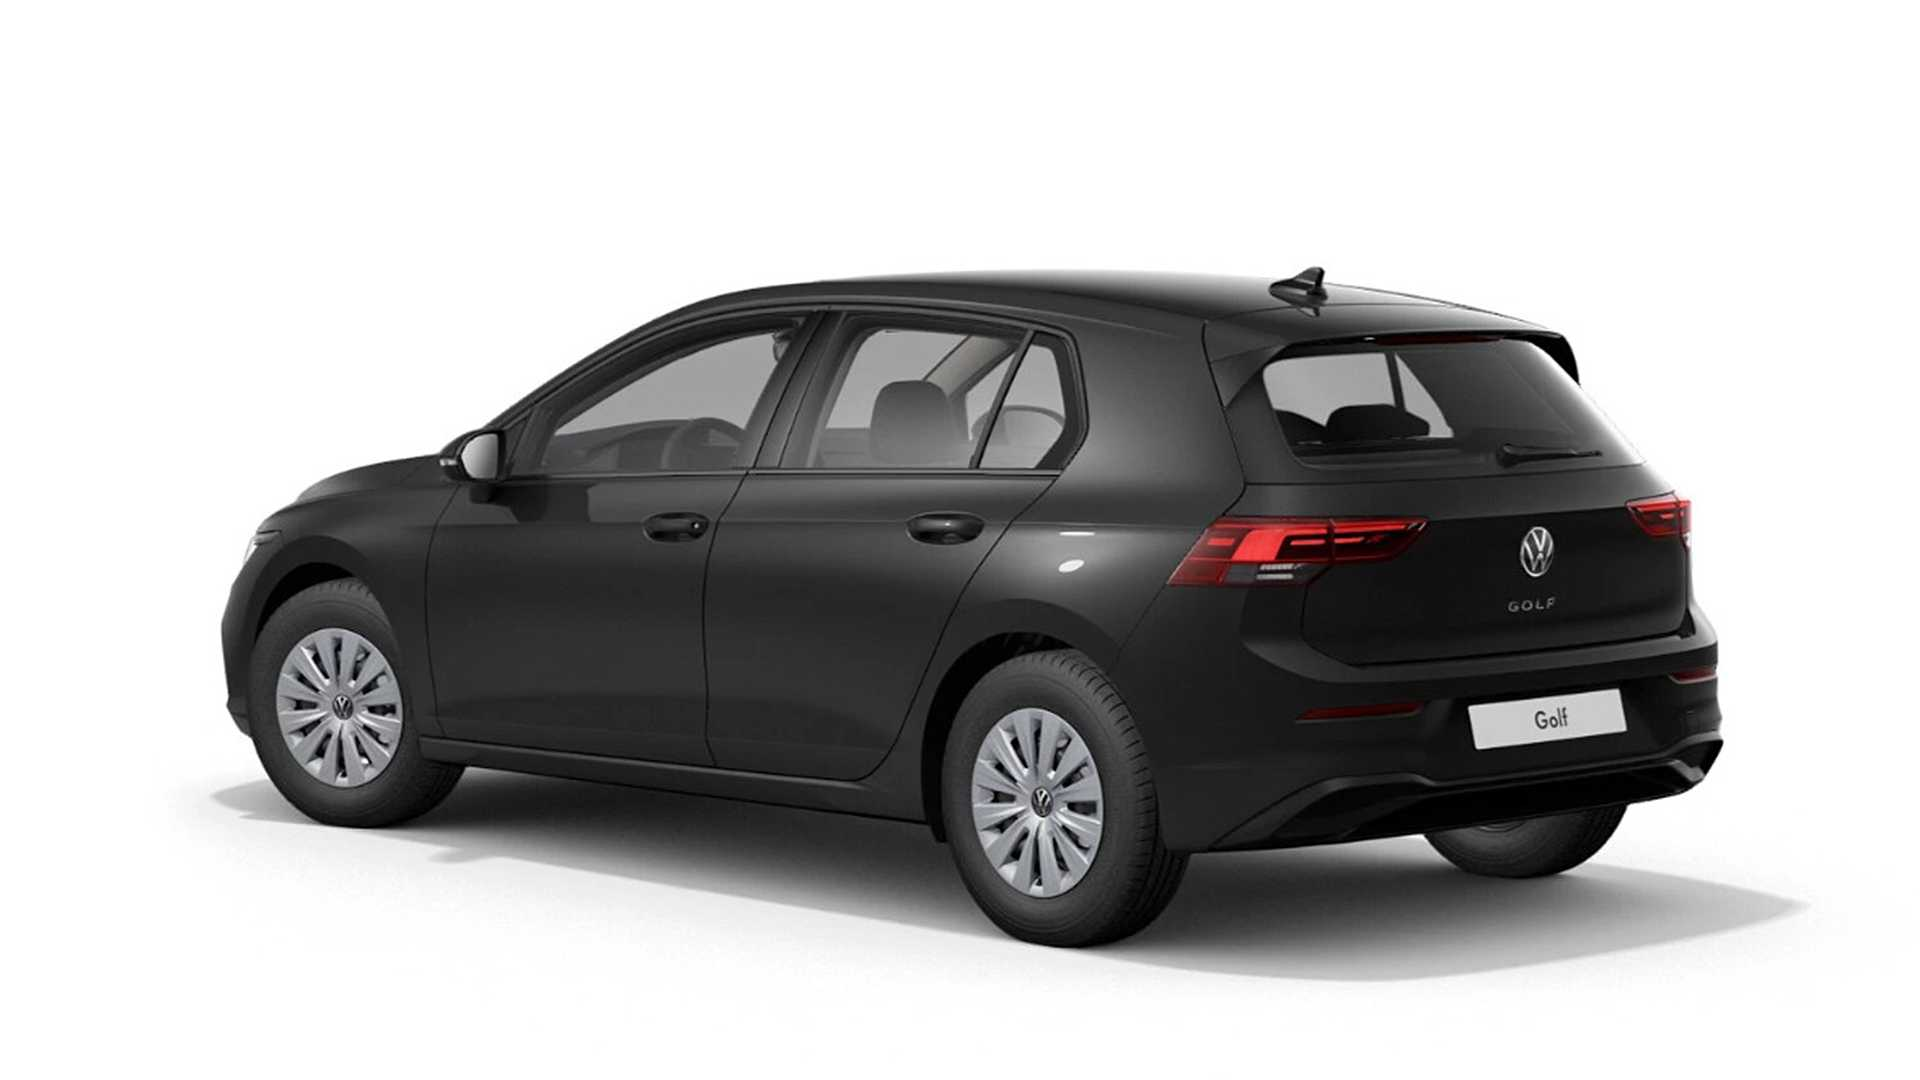 Volkswagen-Golf-2020-Base-Model-2